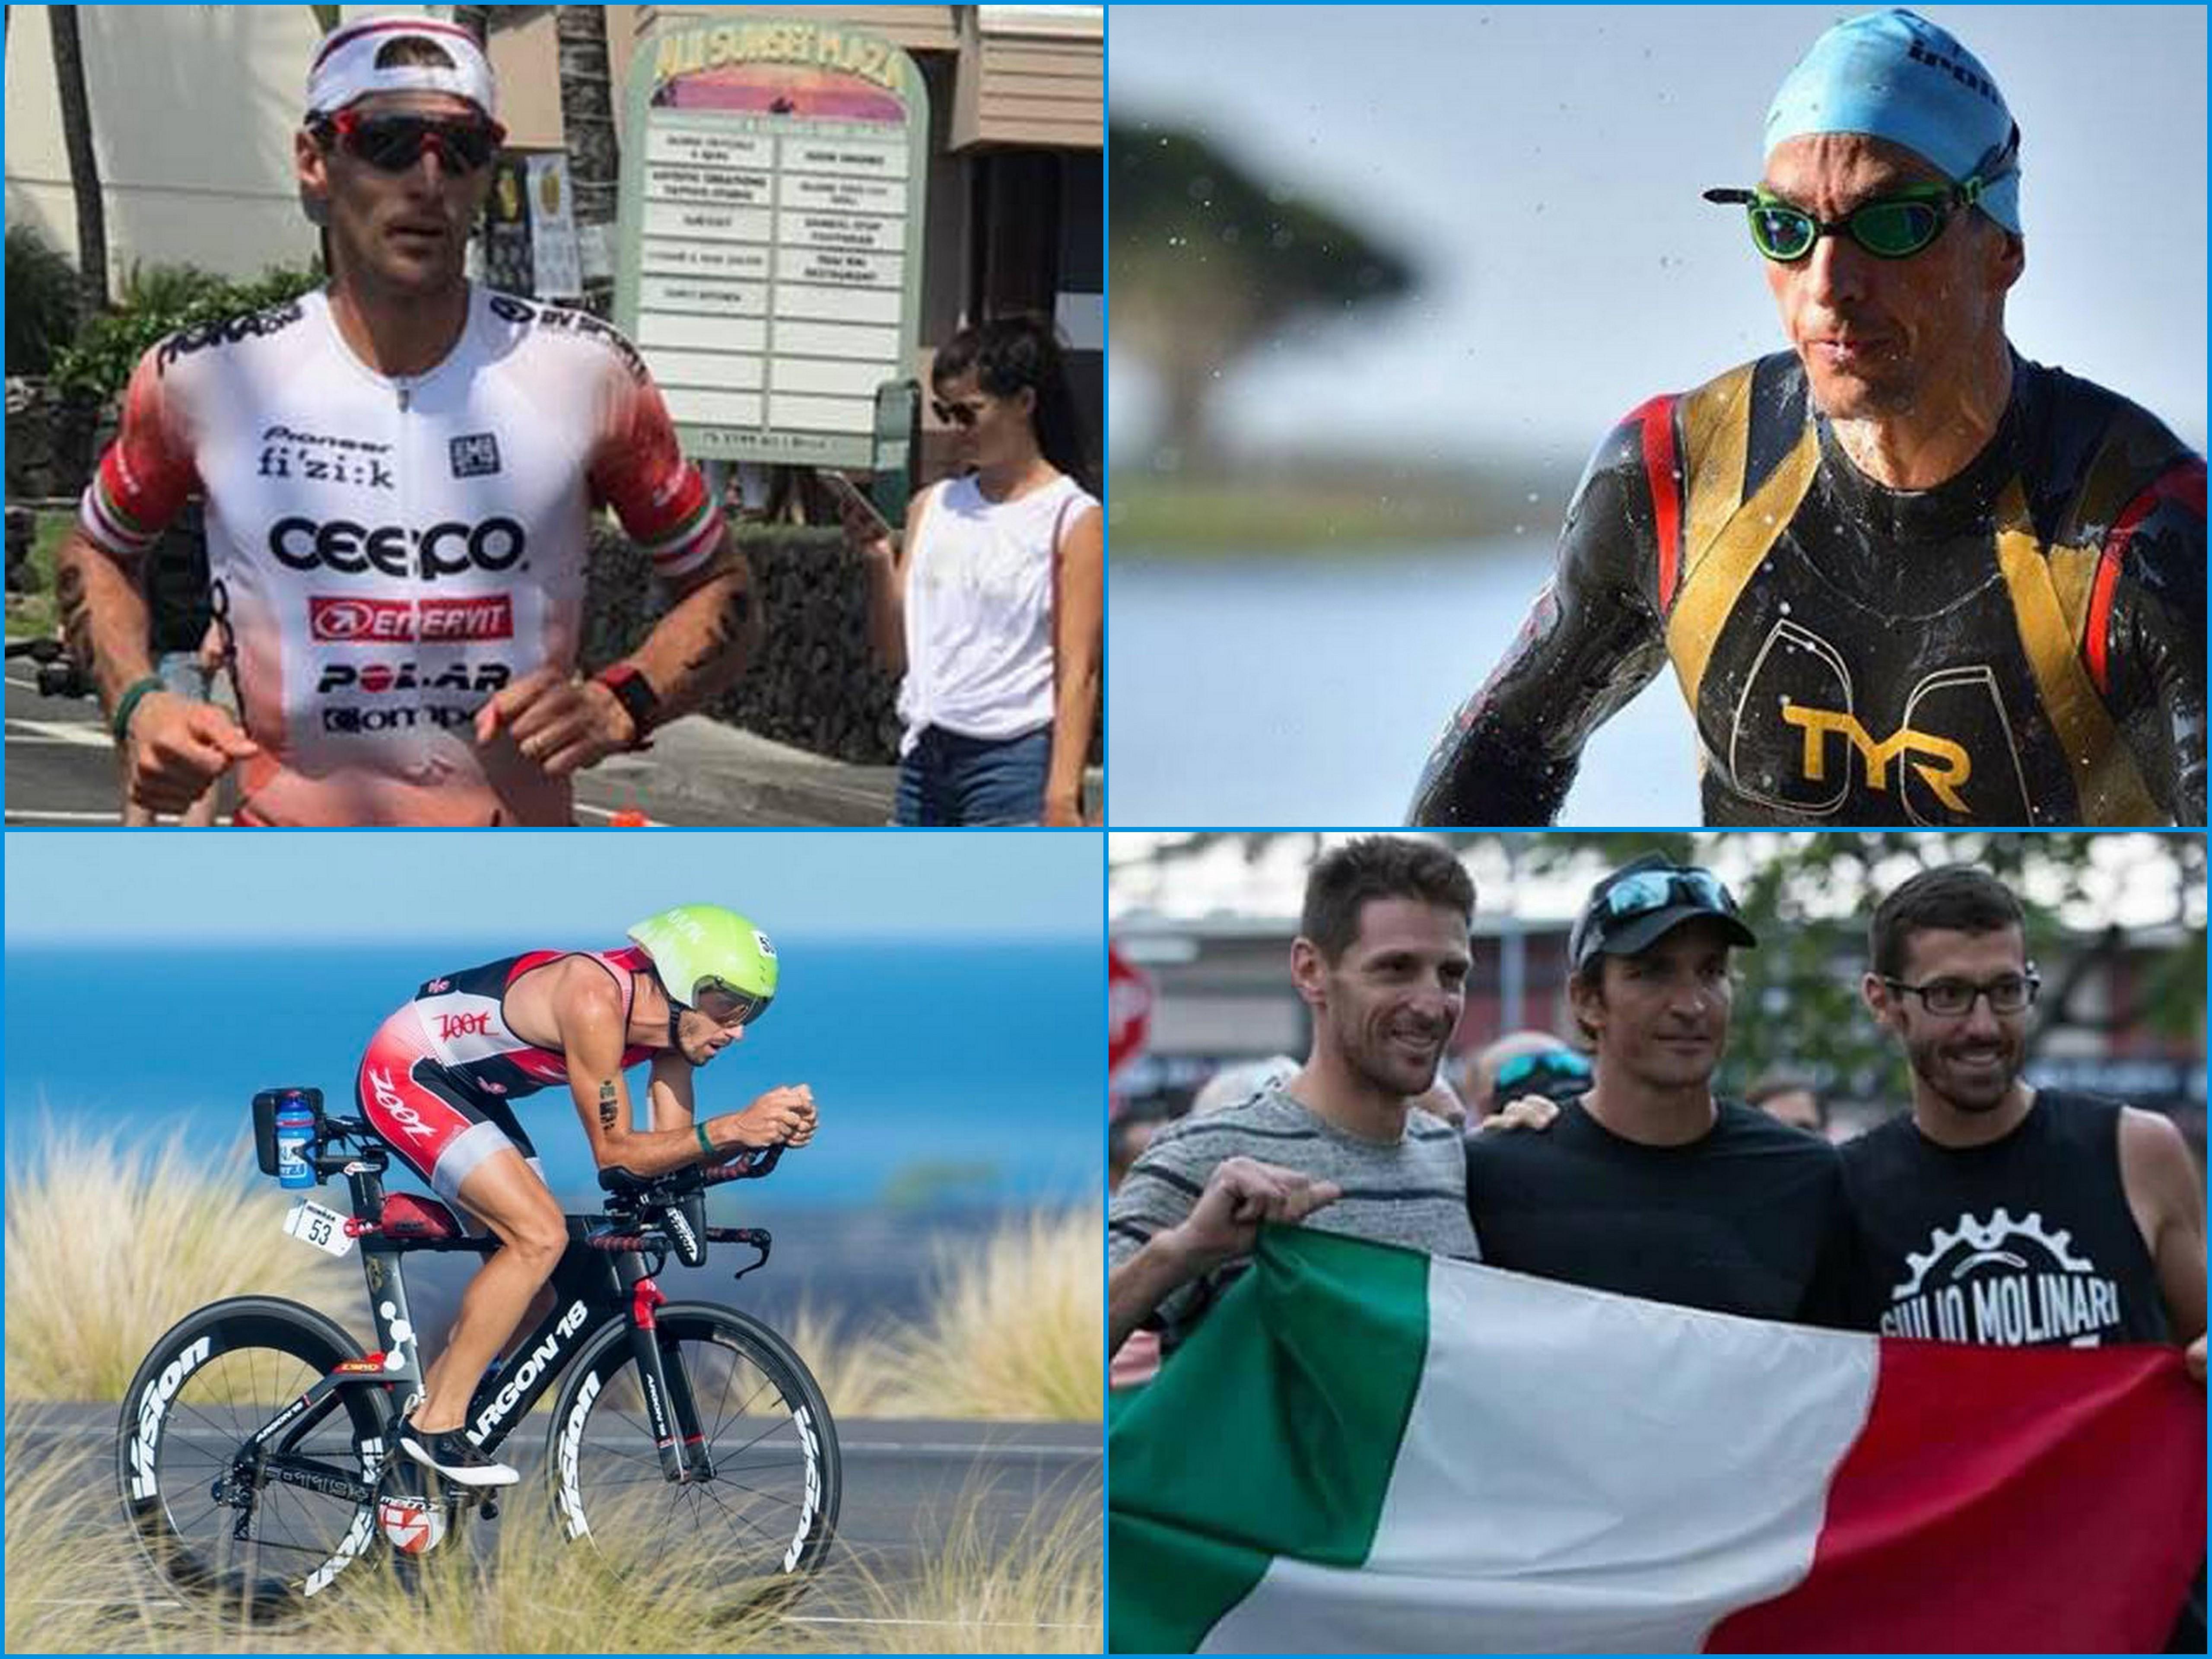 ironman world championship hawaii 2017: alessandro degasperi, giulio molinari e daniel fontana in gara (italia team) triathlon